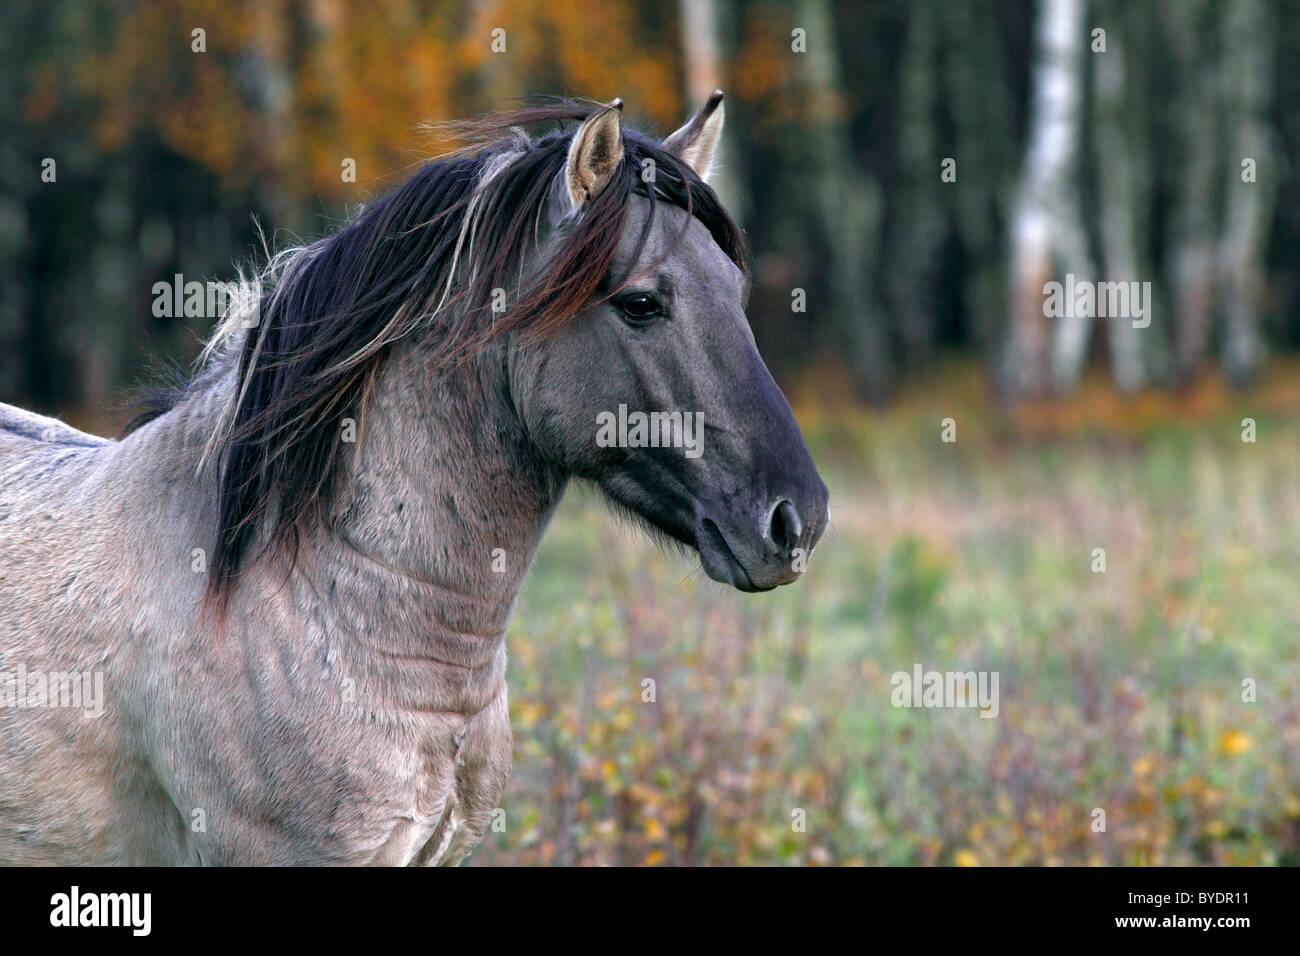 Konik horse (Equus przewalskii f. caballus), stallion, Tarpan rebreeding, portrait Stock Photo